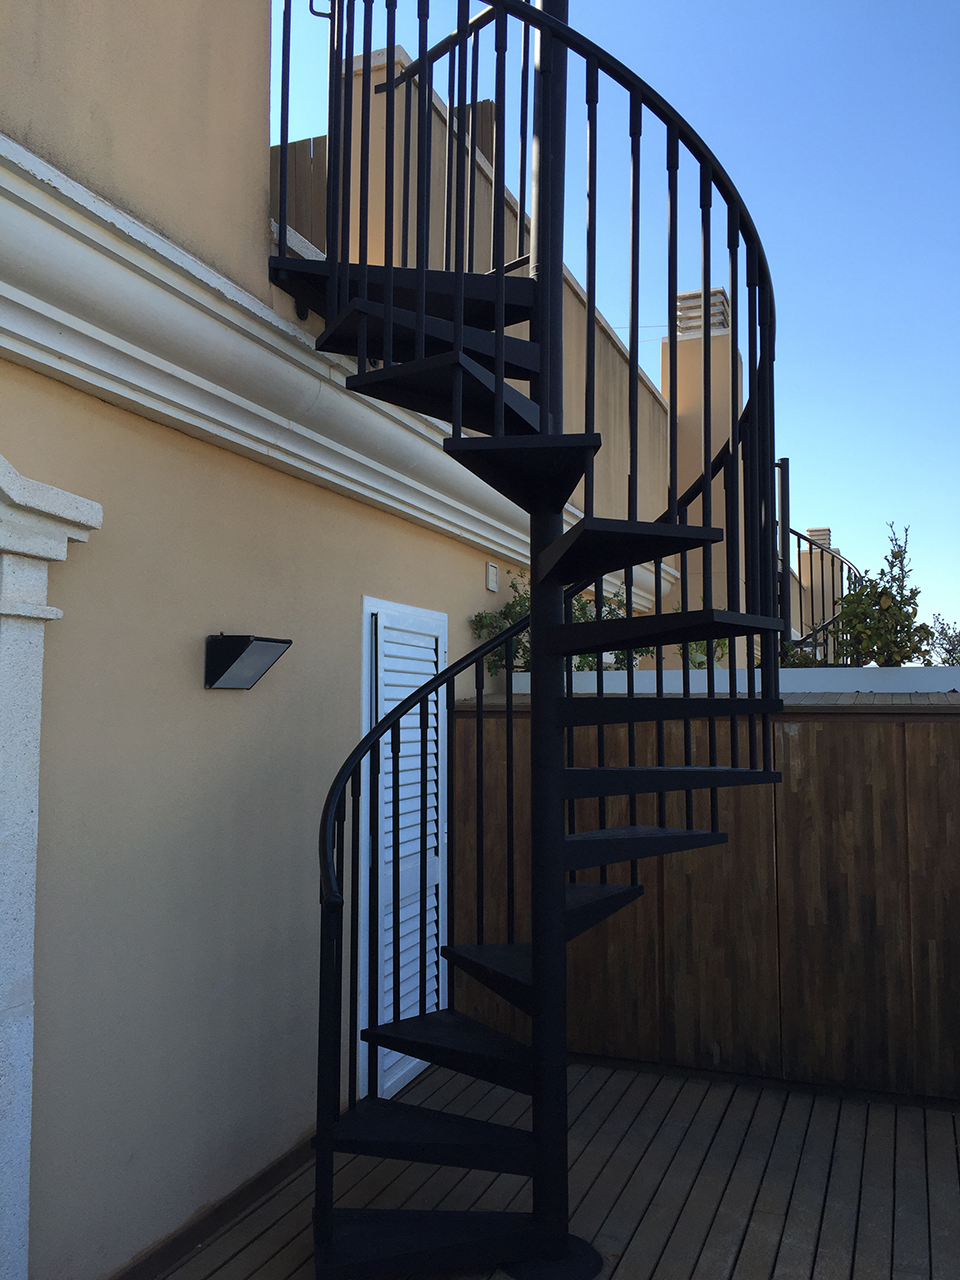 Pintaecol gic pintura de protecci n de escalera met lica - Escaleras de exterior ...